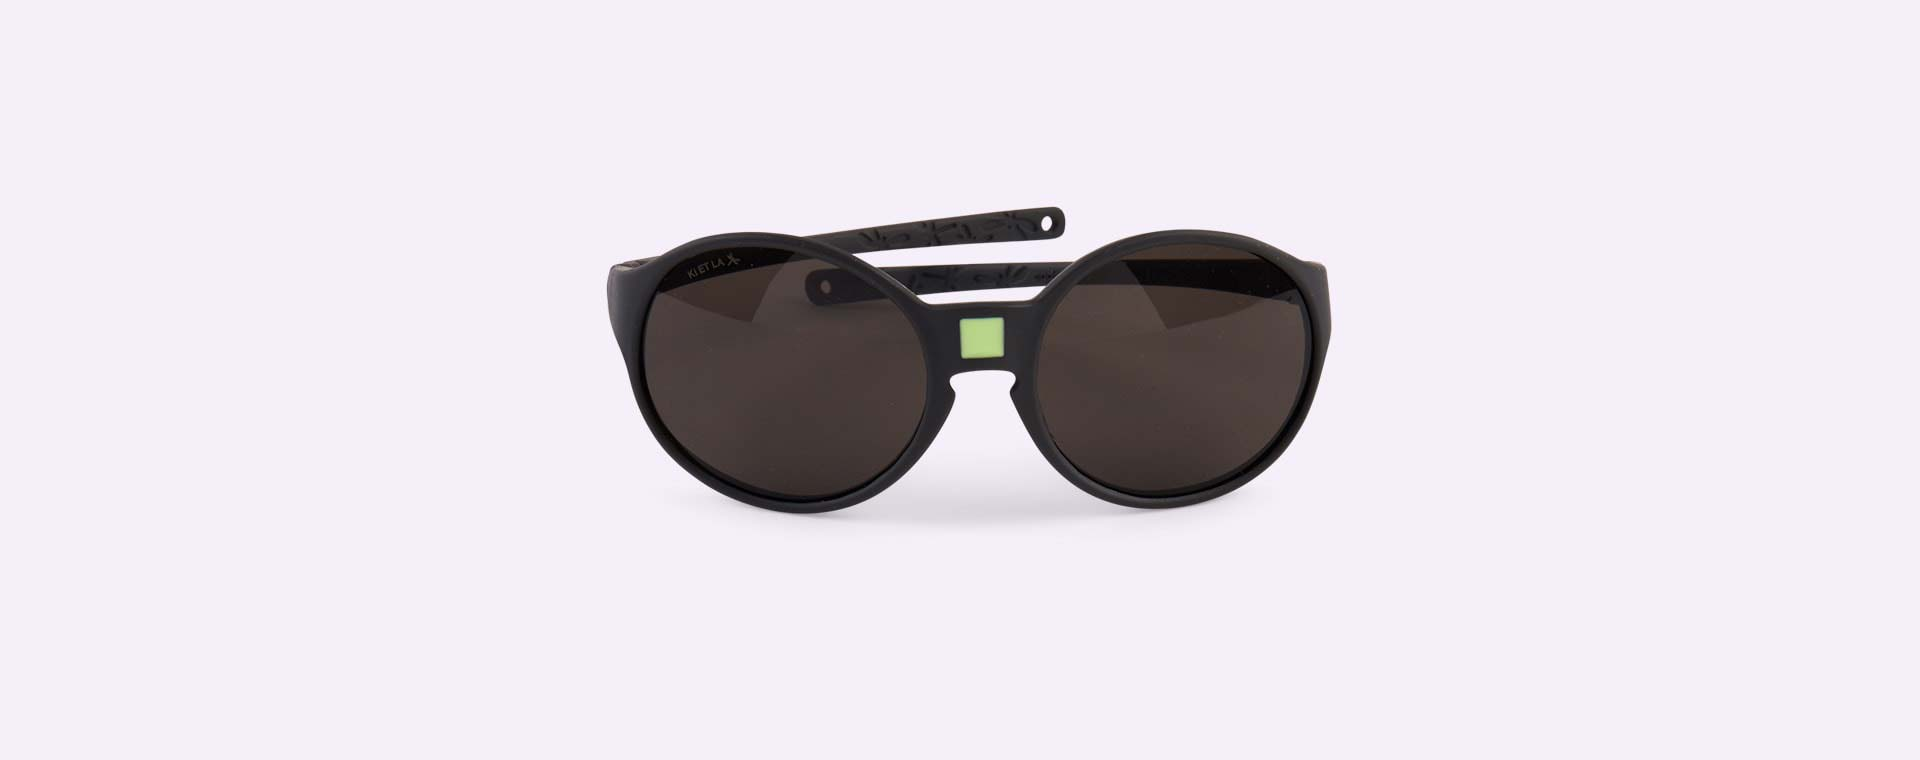 Gris Ki ET LA Jokakids' Kids Sunglasses